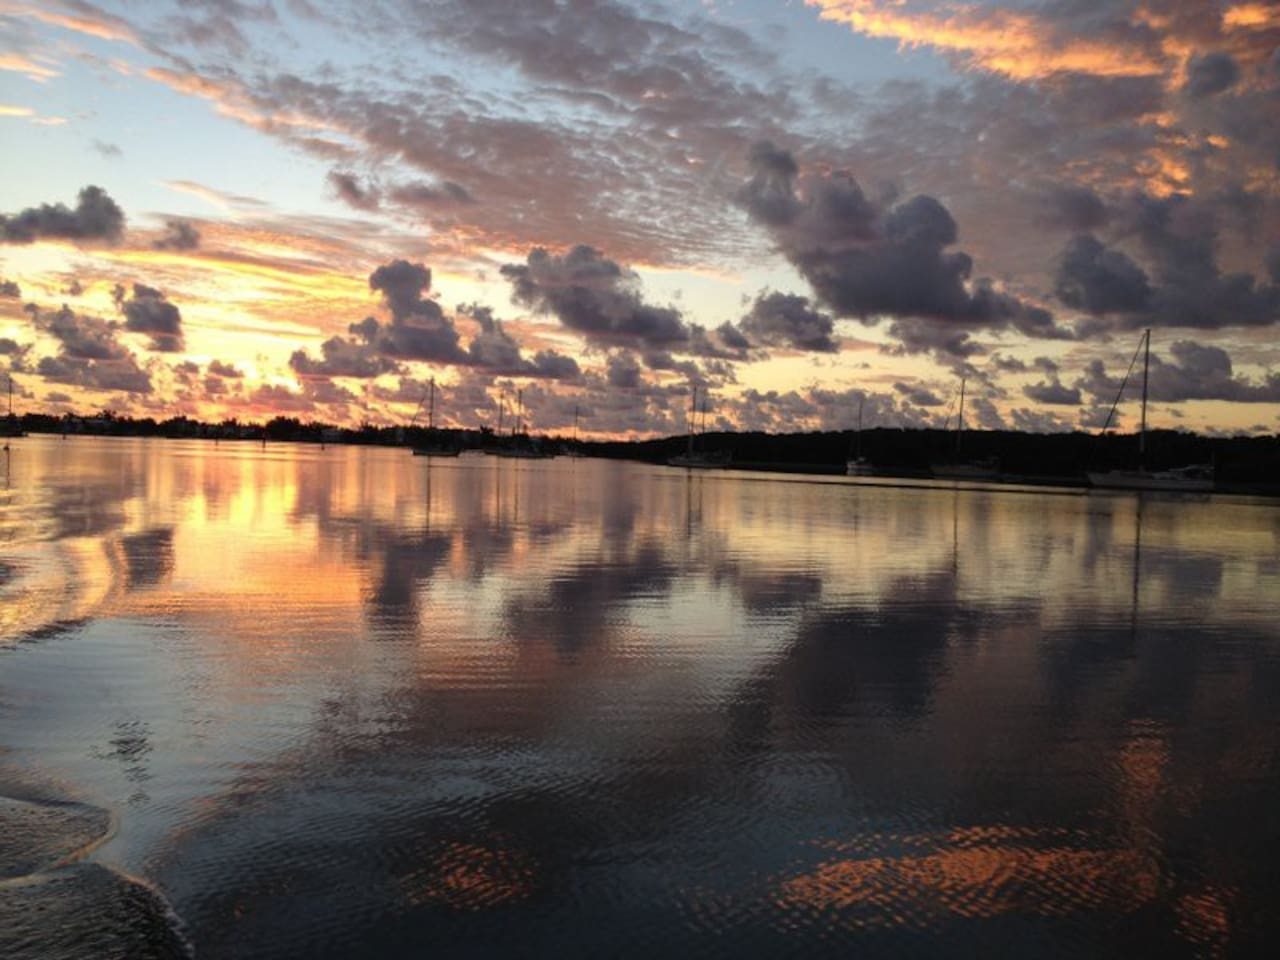 Harbor view at dawn